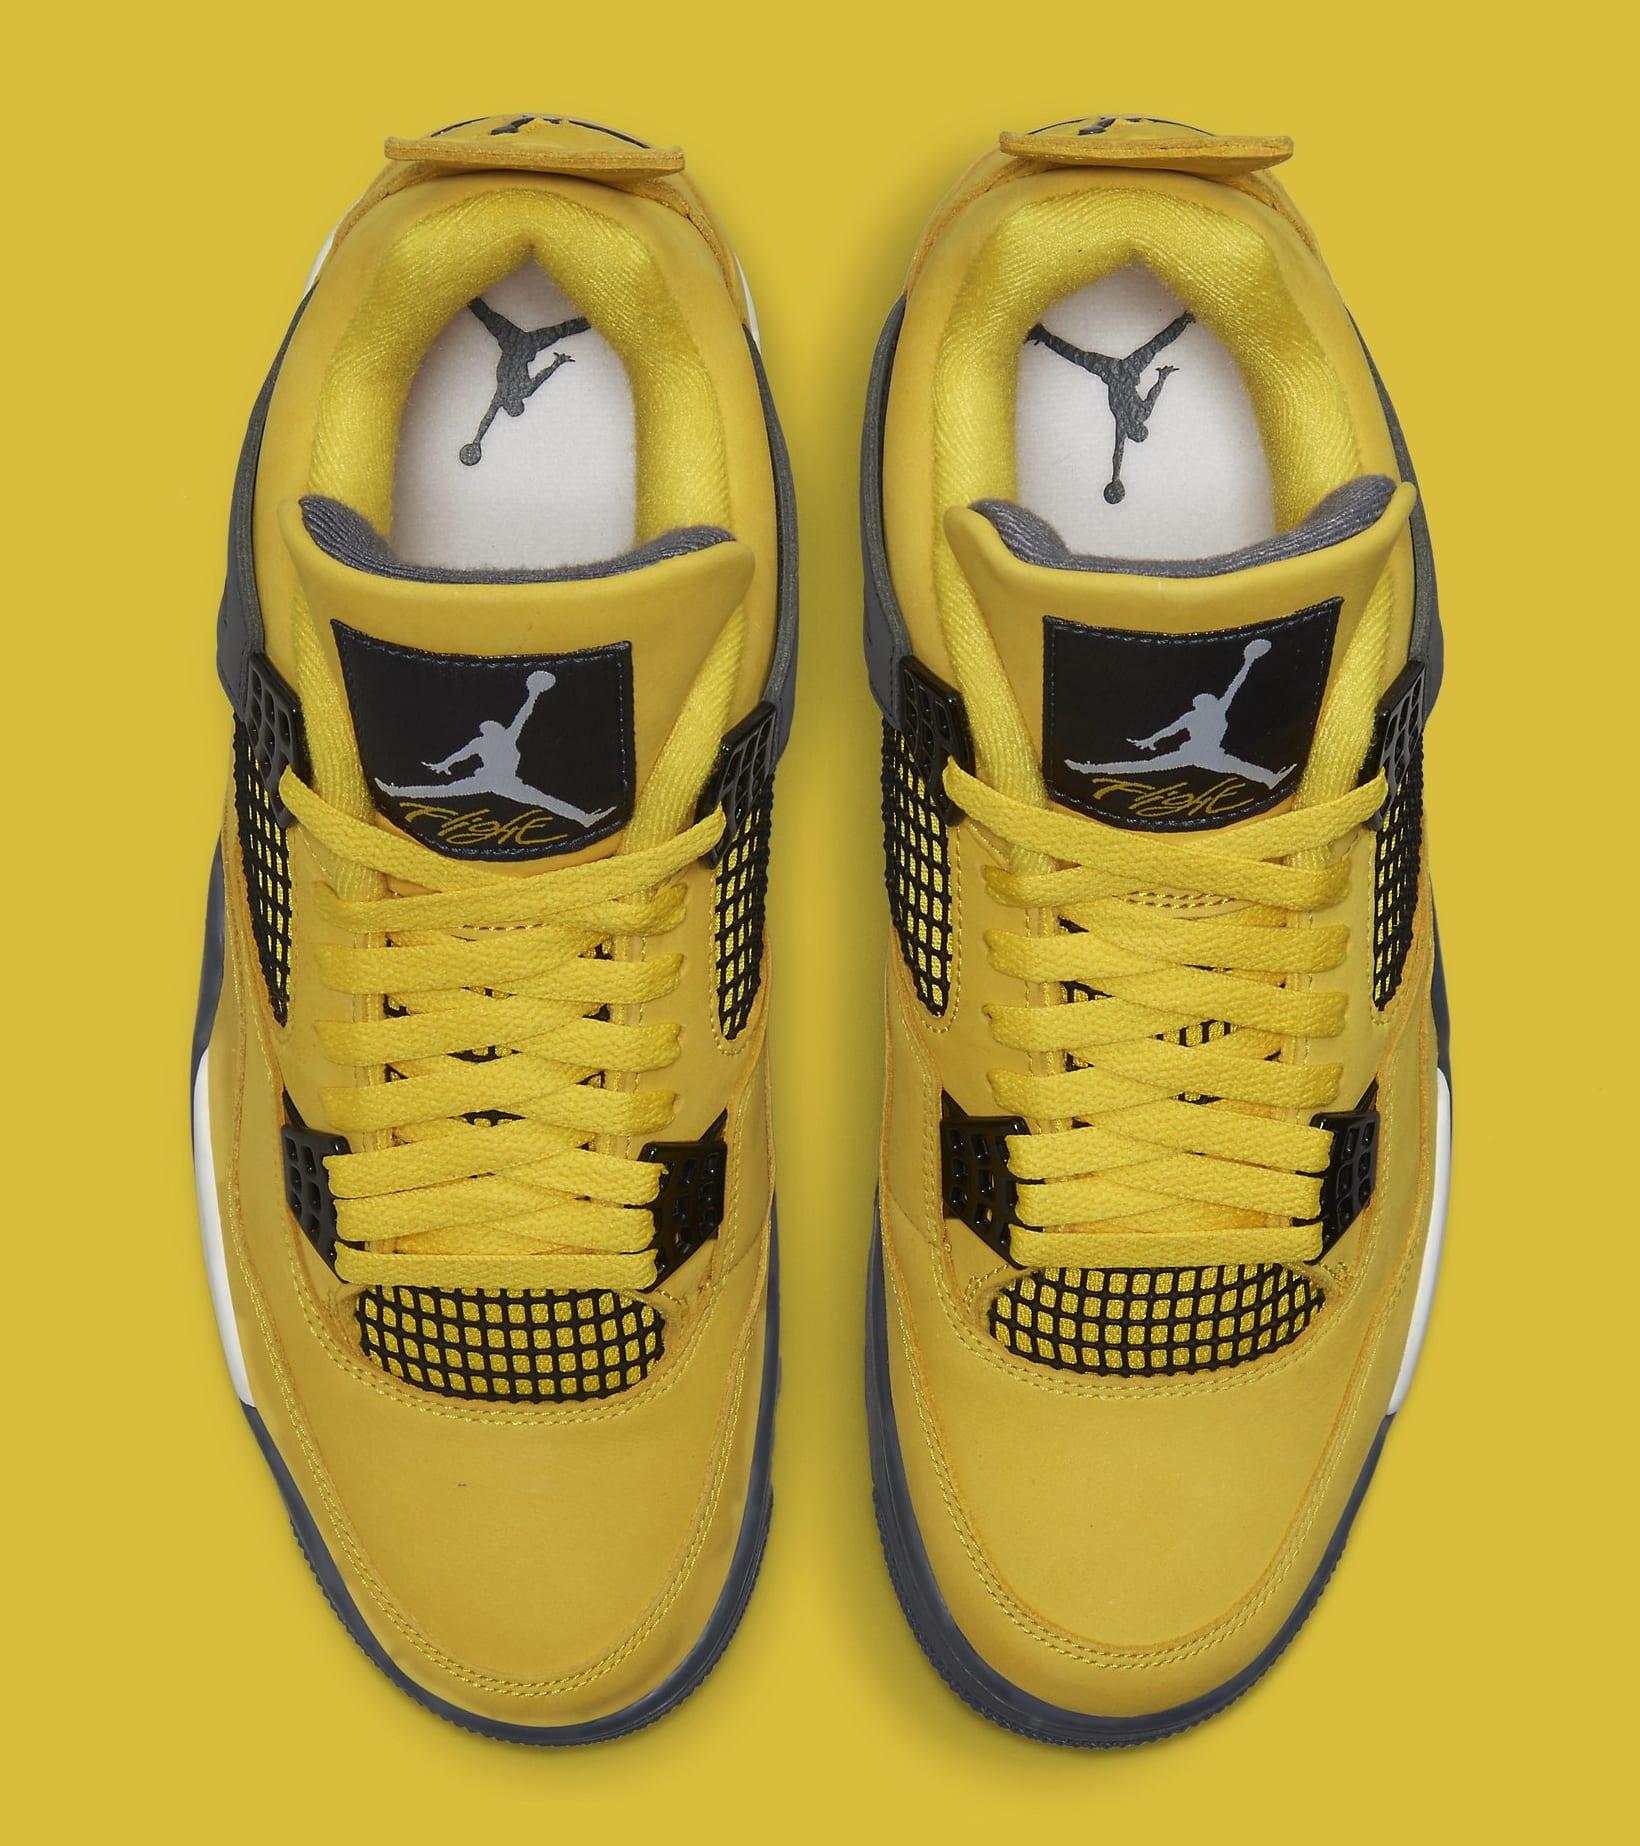 Air Jordan 4 Retro 'Lightning' CT8527-700 Top